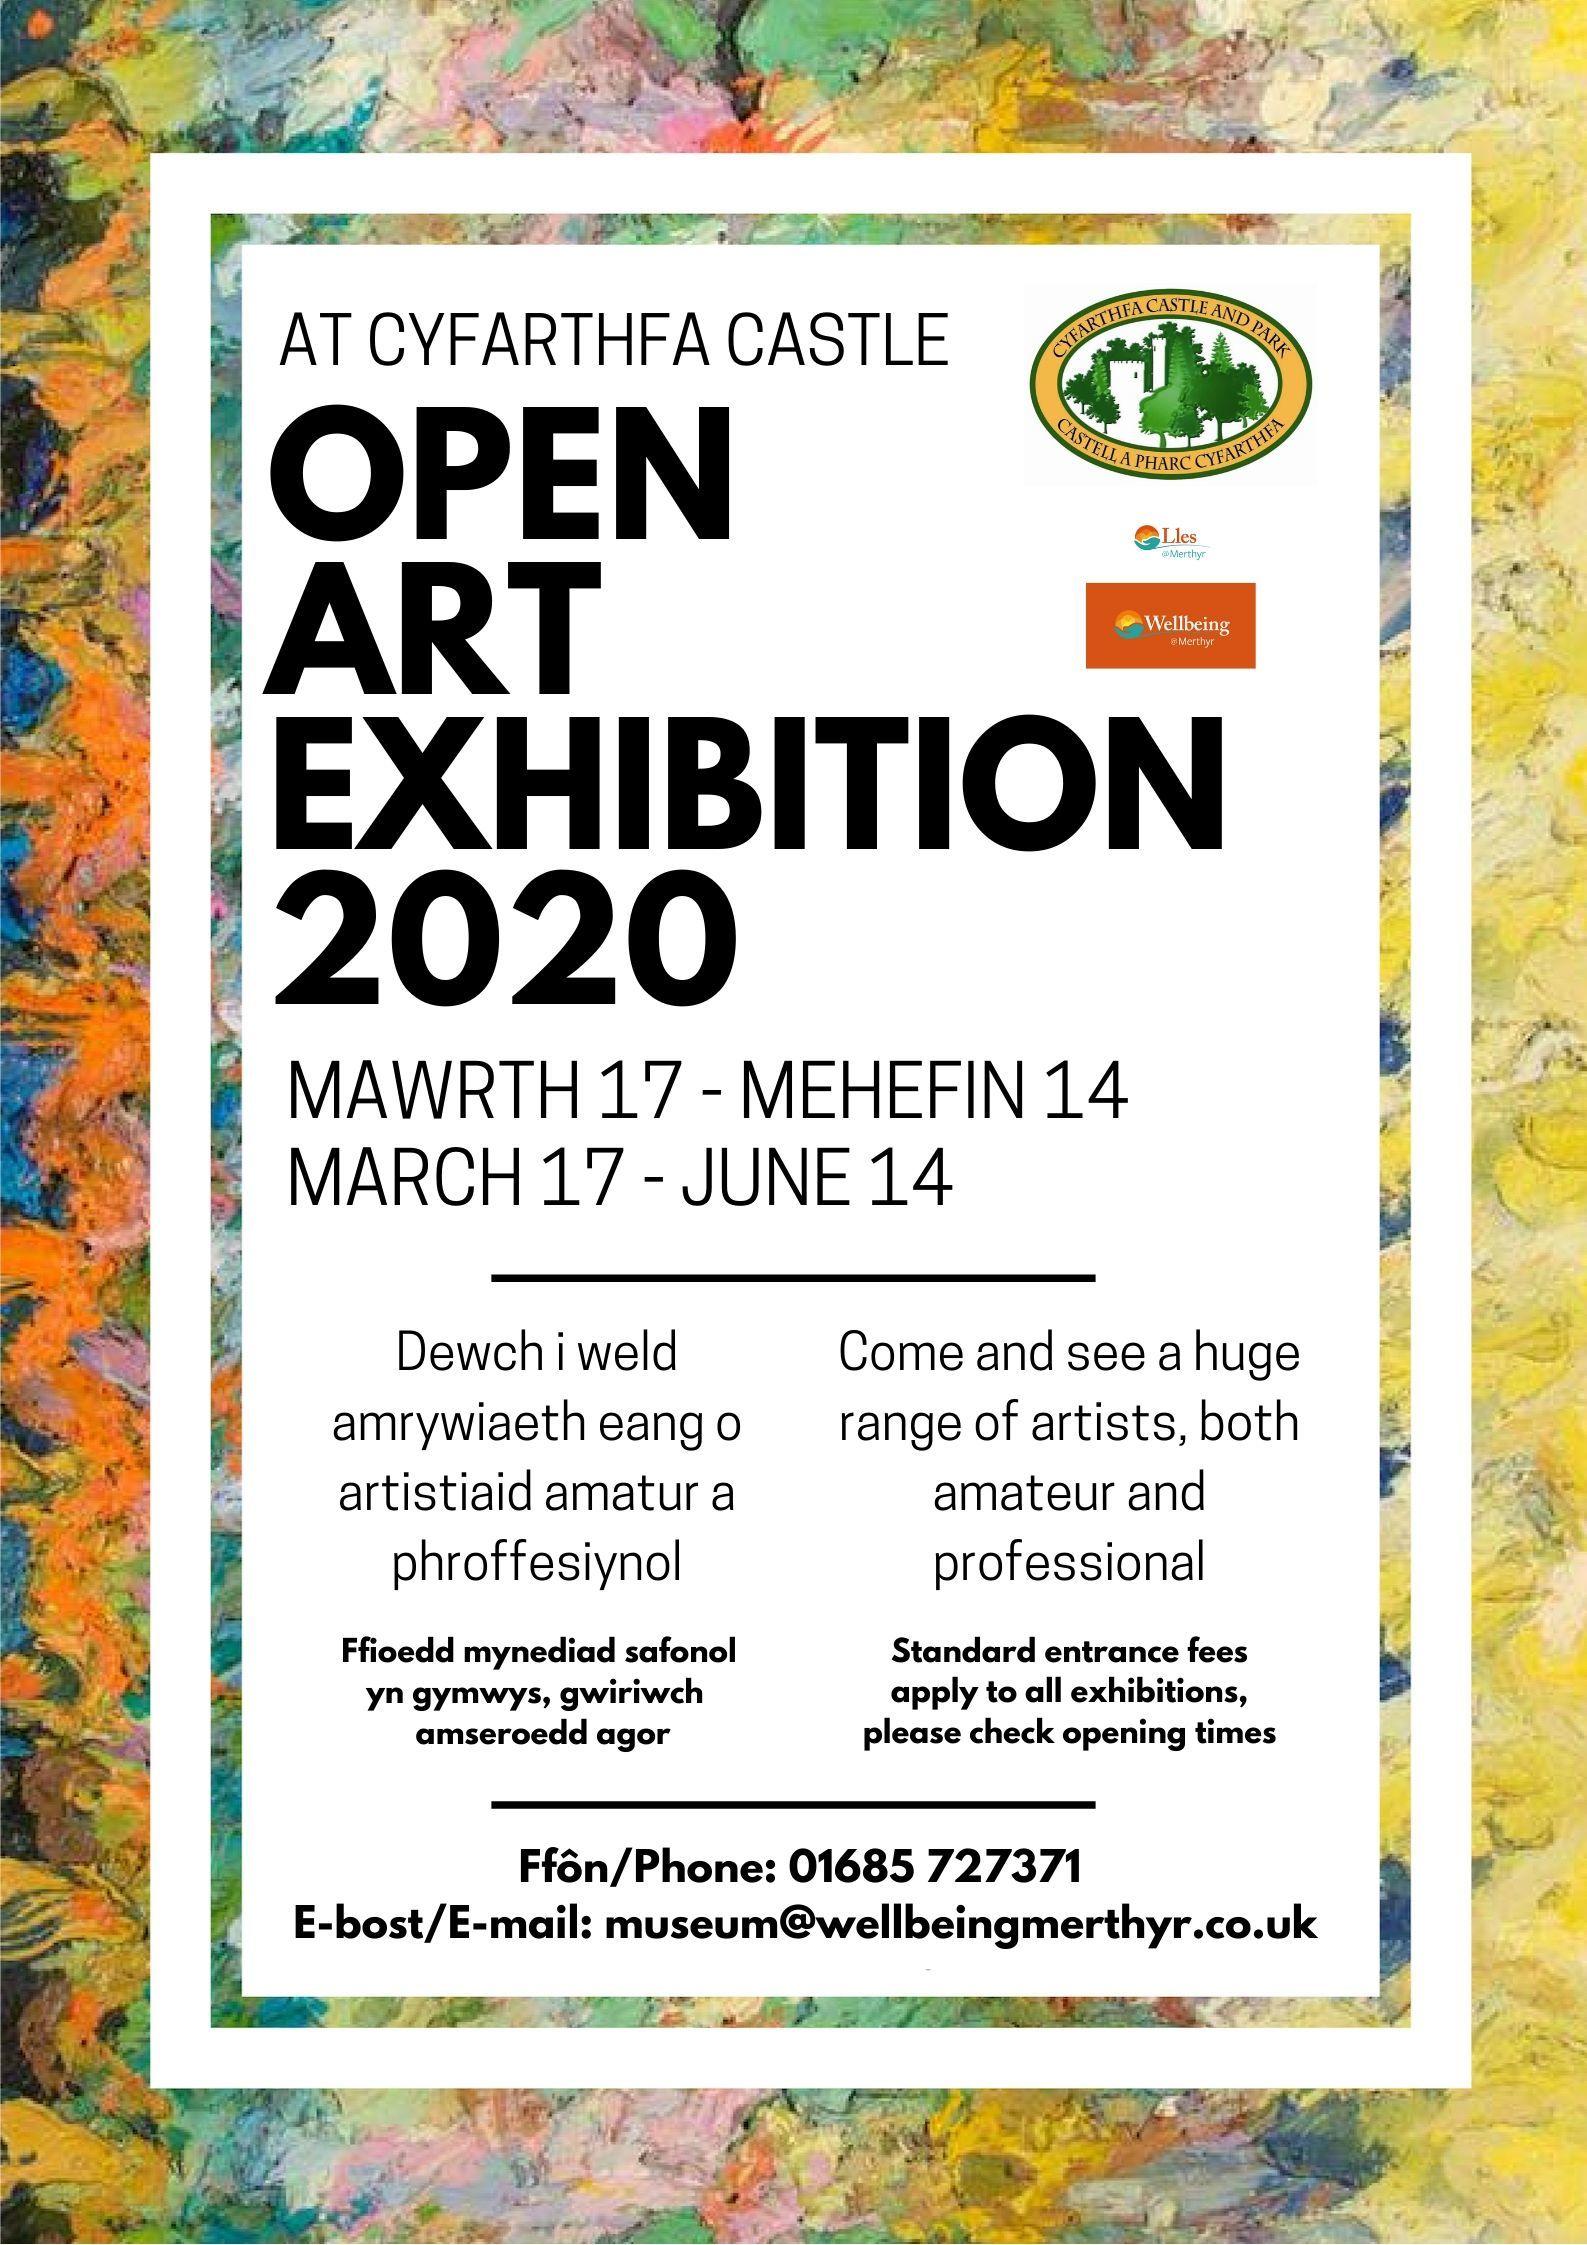 Open Art Exhibition Cyfarthfa Castle (Merthyr Tydfil)